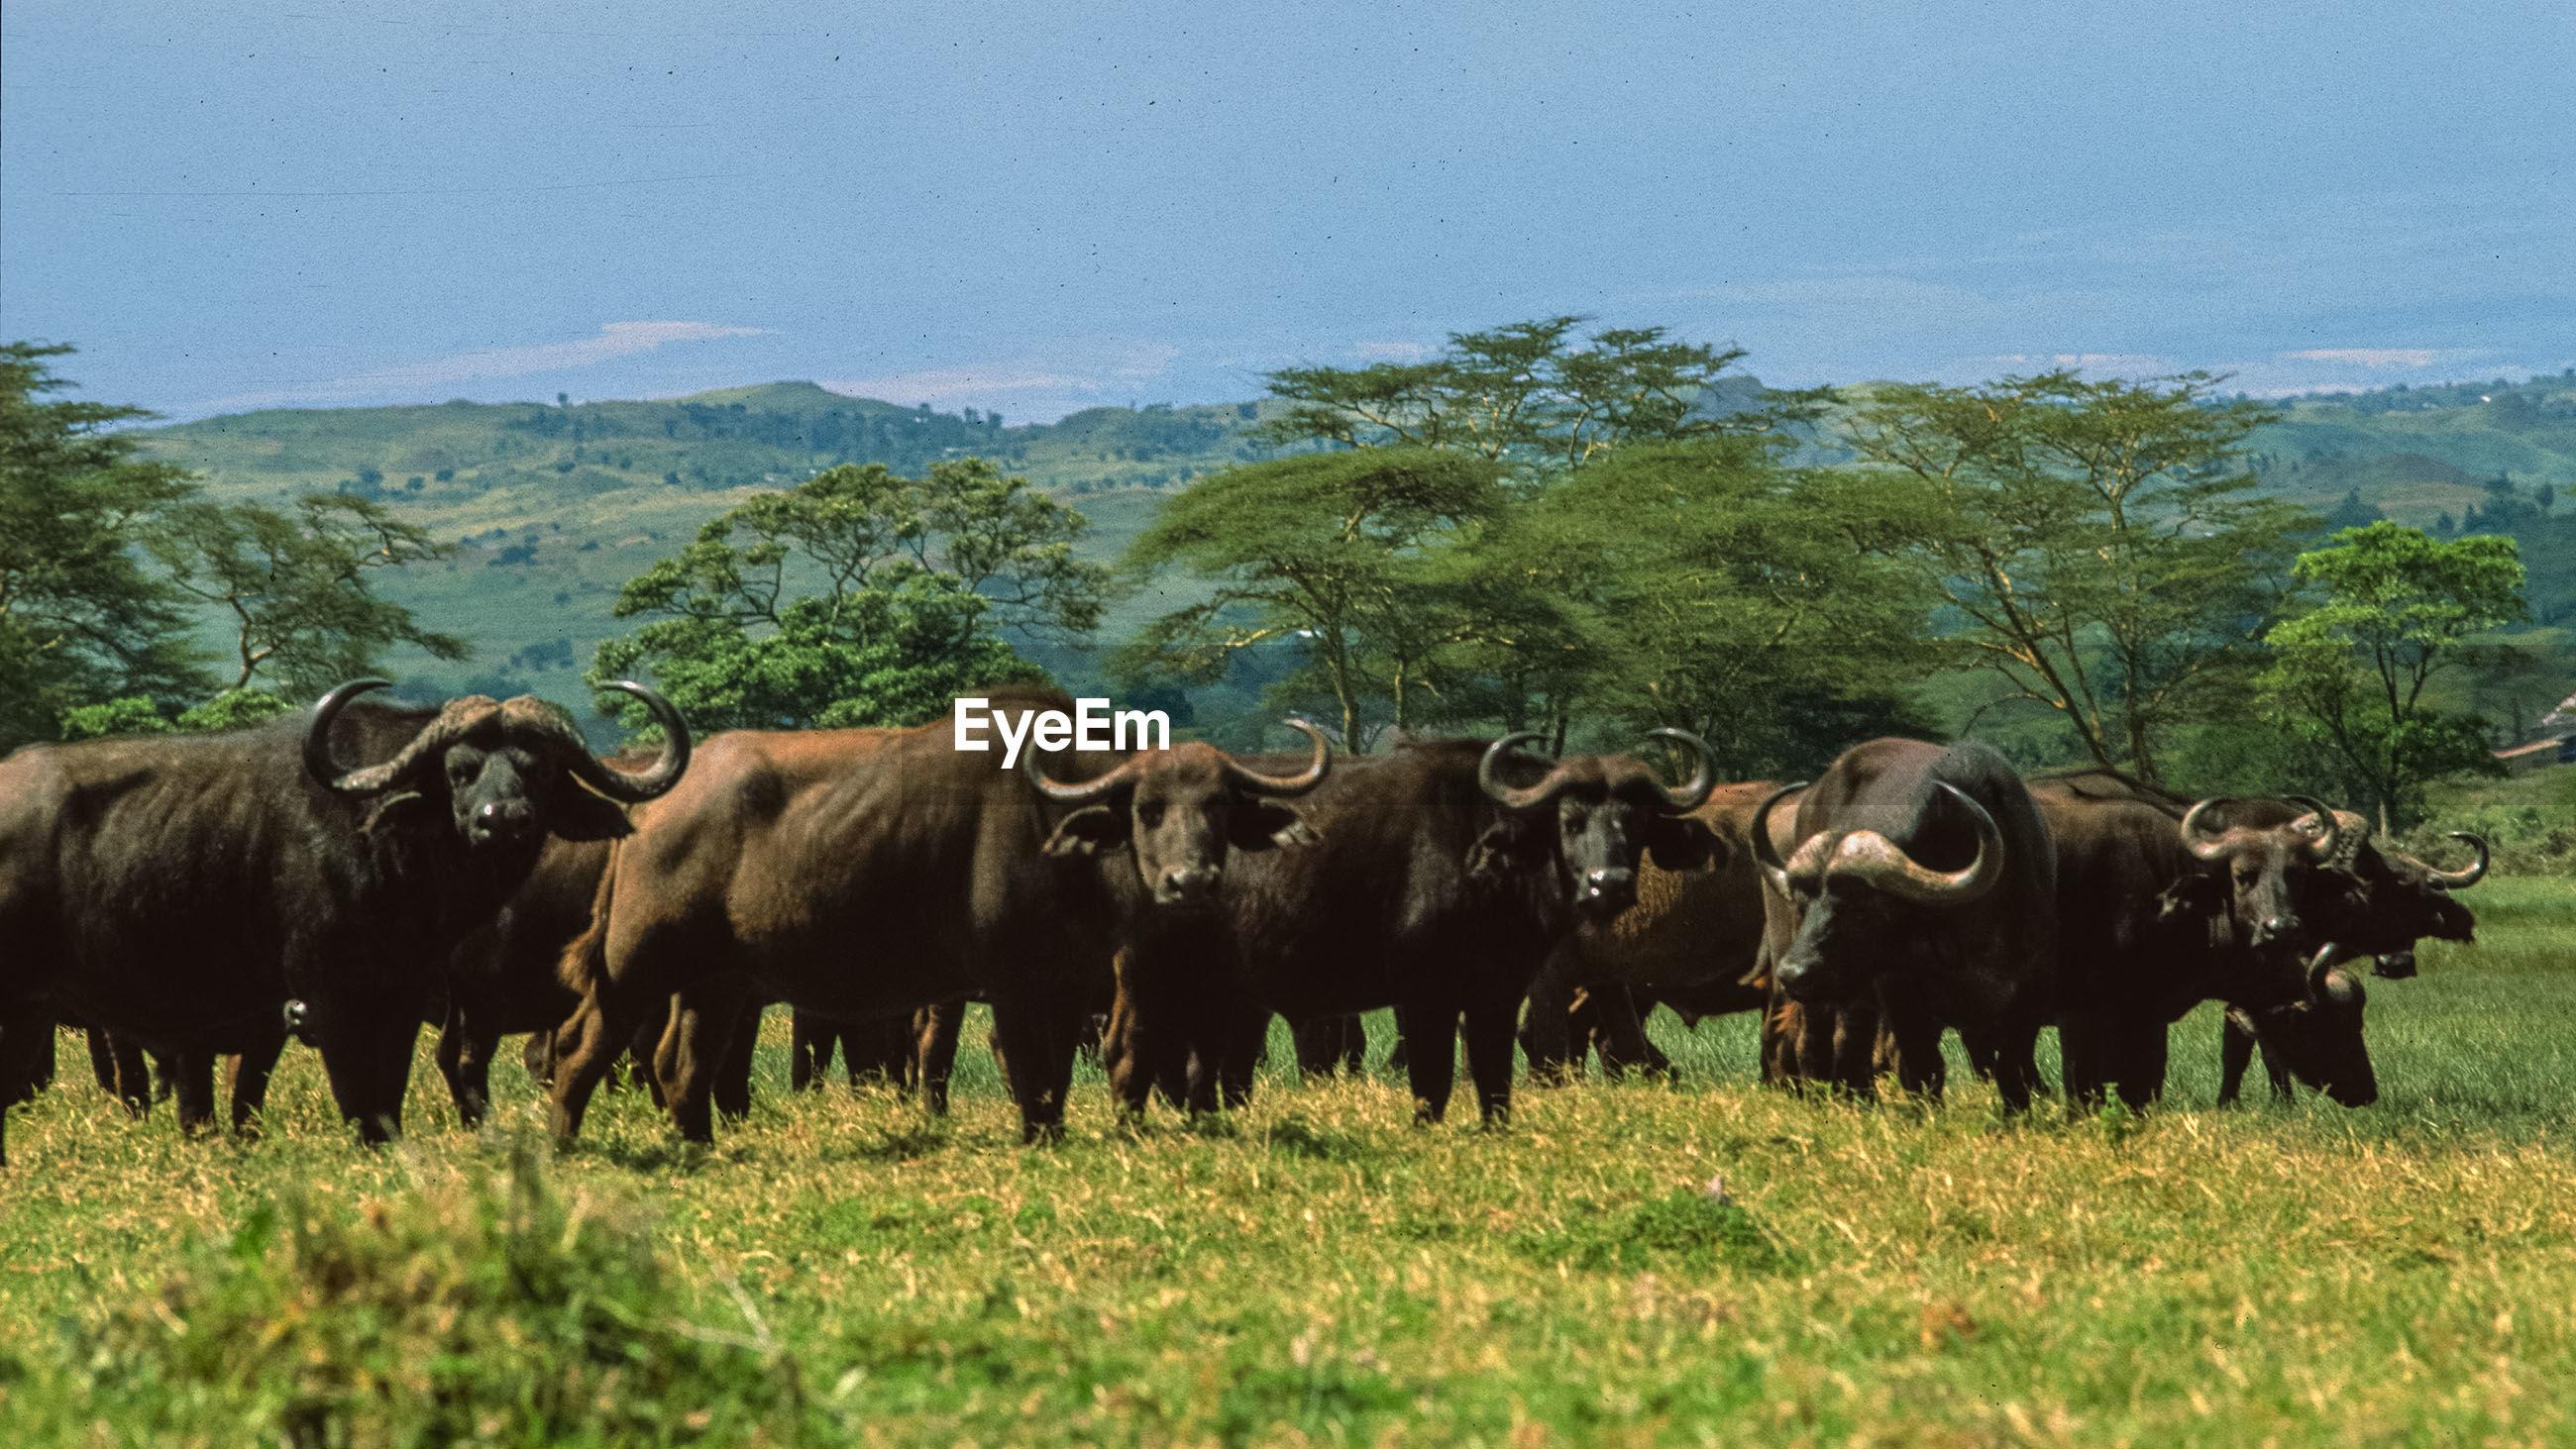 Buffalo grazing on grassy field